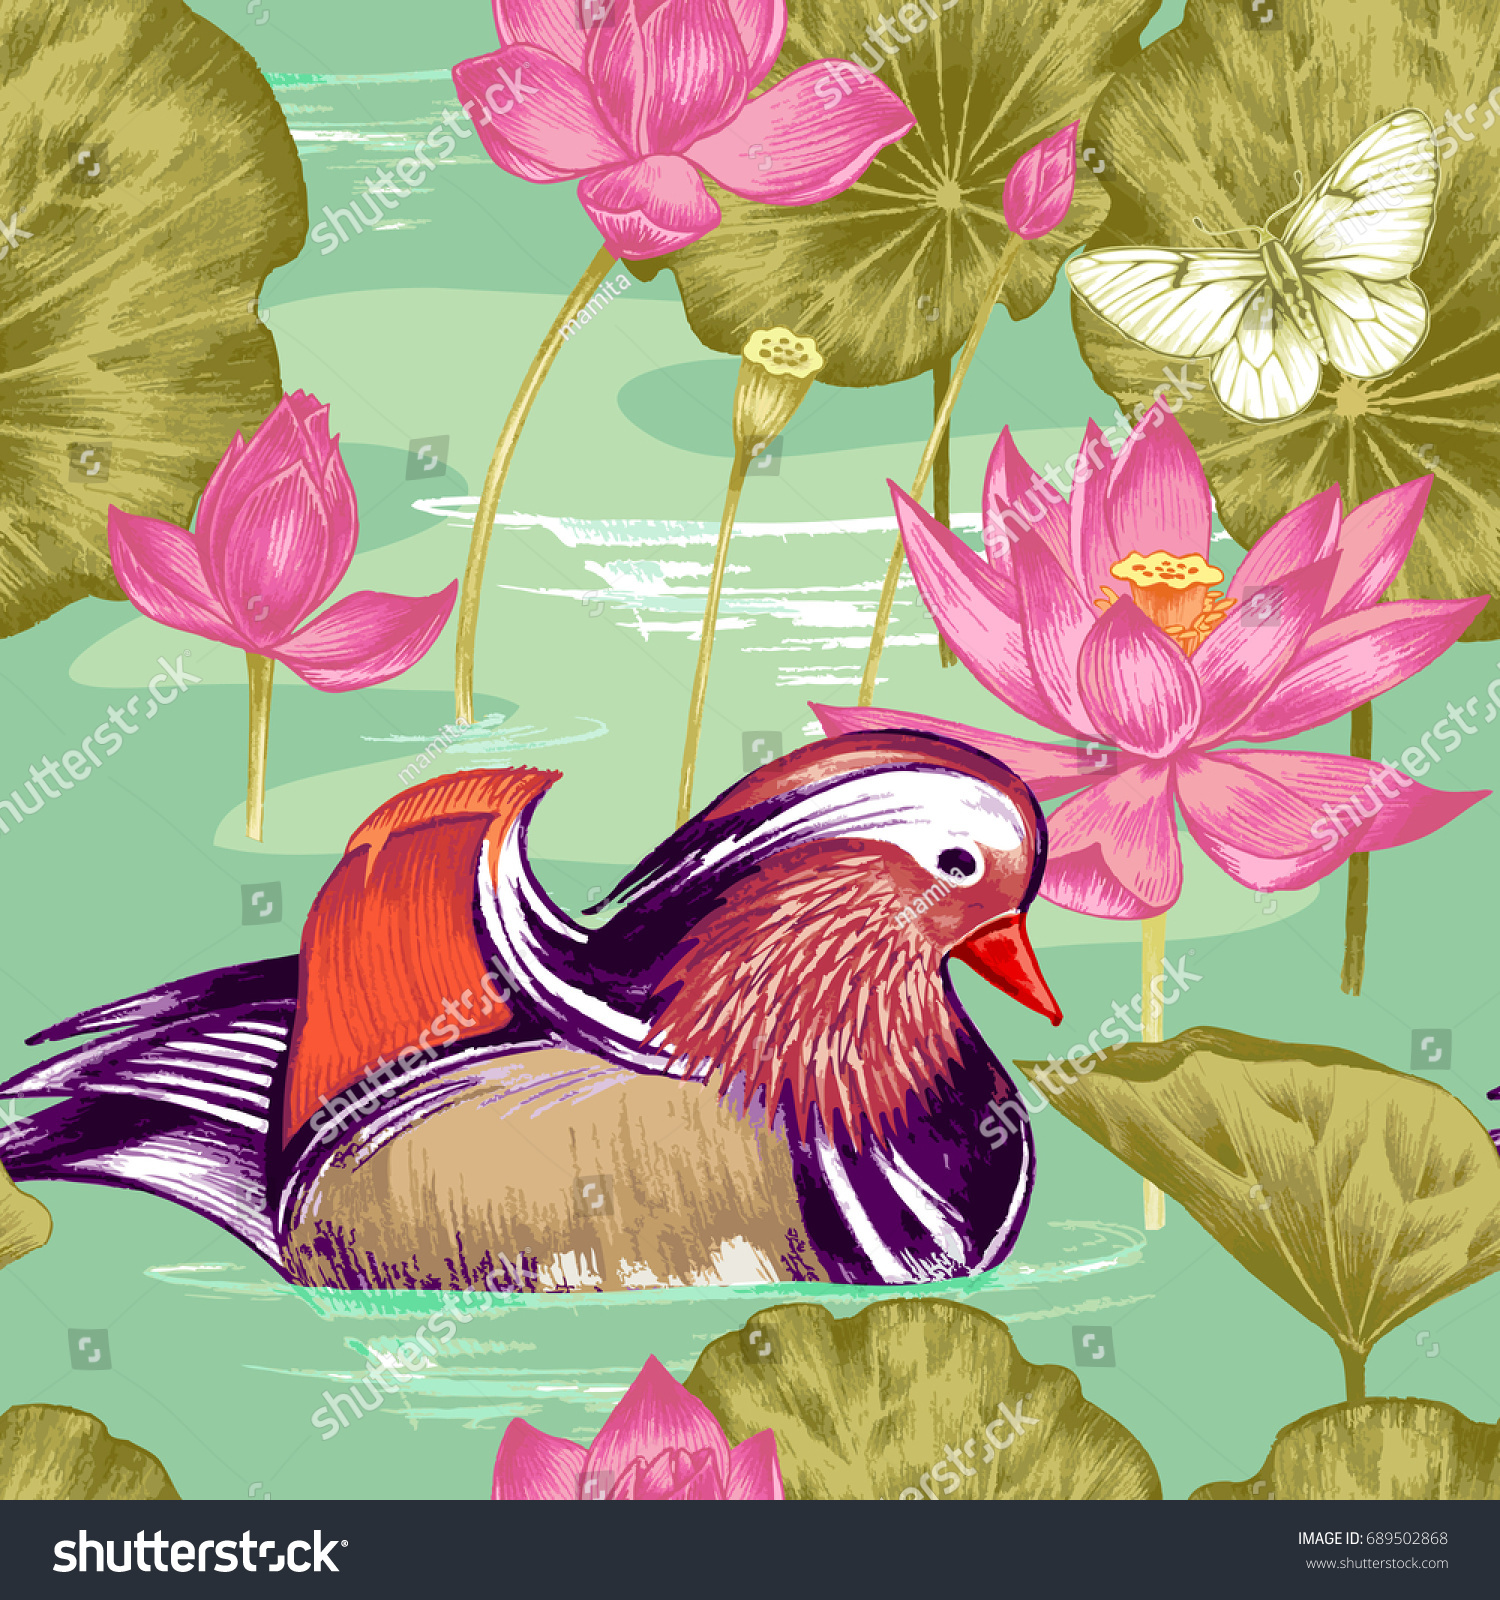 Royalty Free Stock Illustration Of Lotus Mandarin Duck Water Drawn